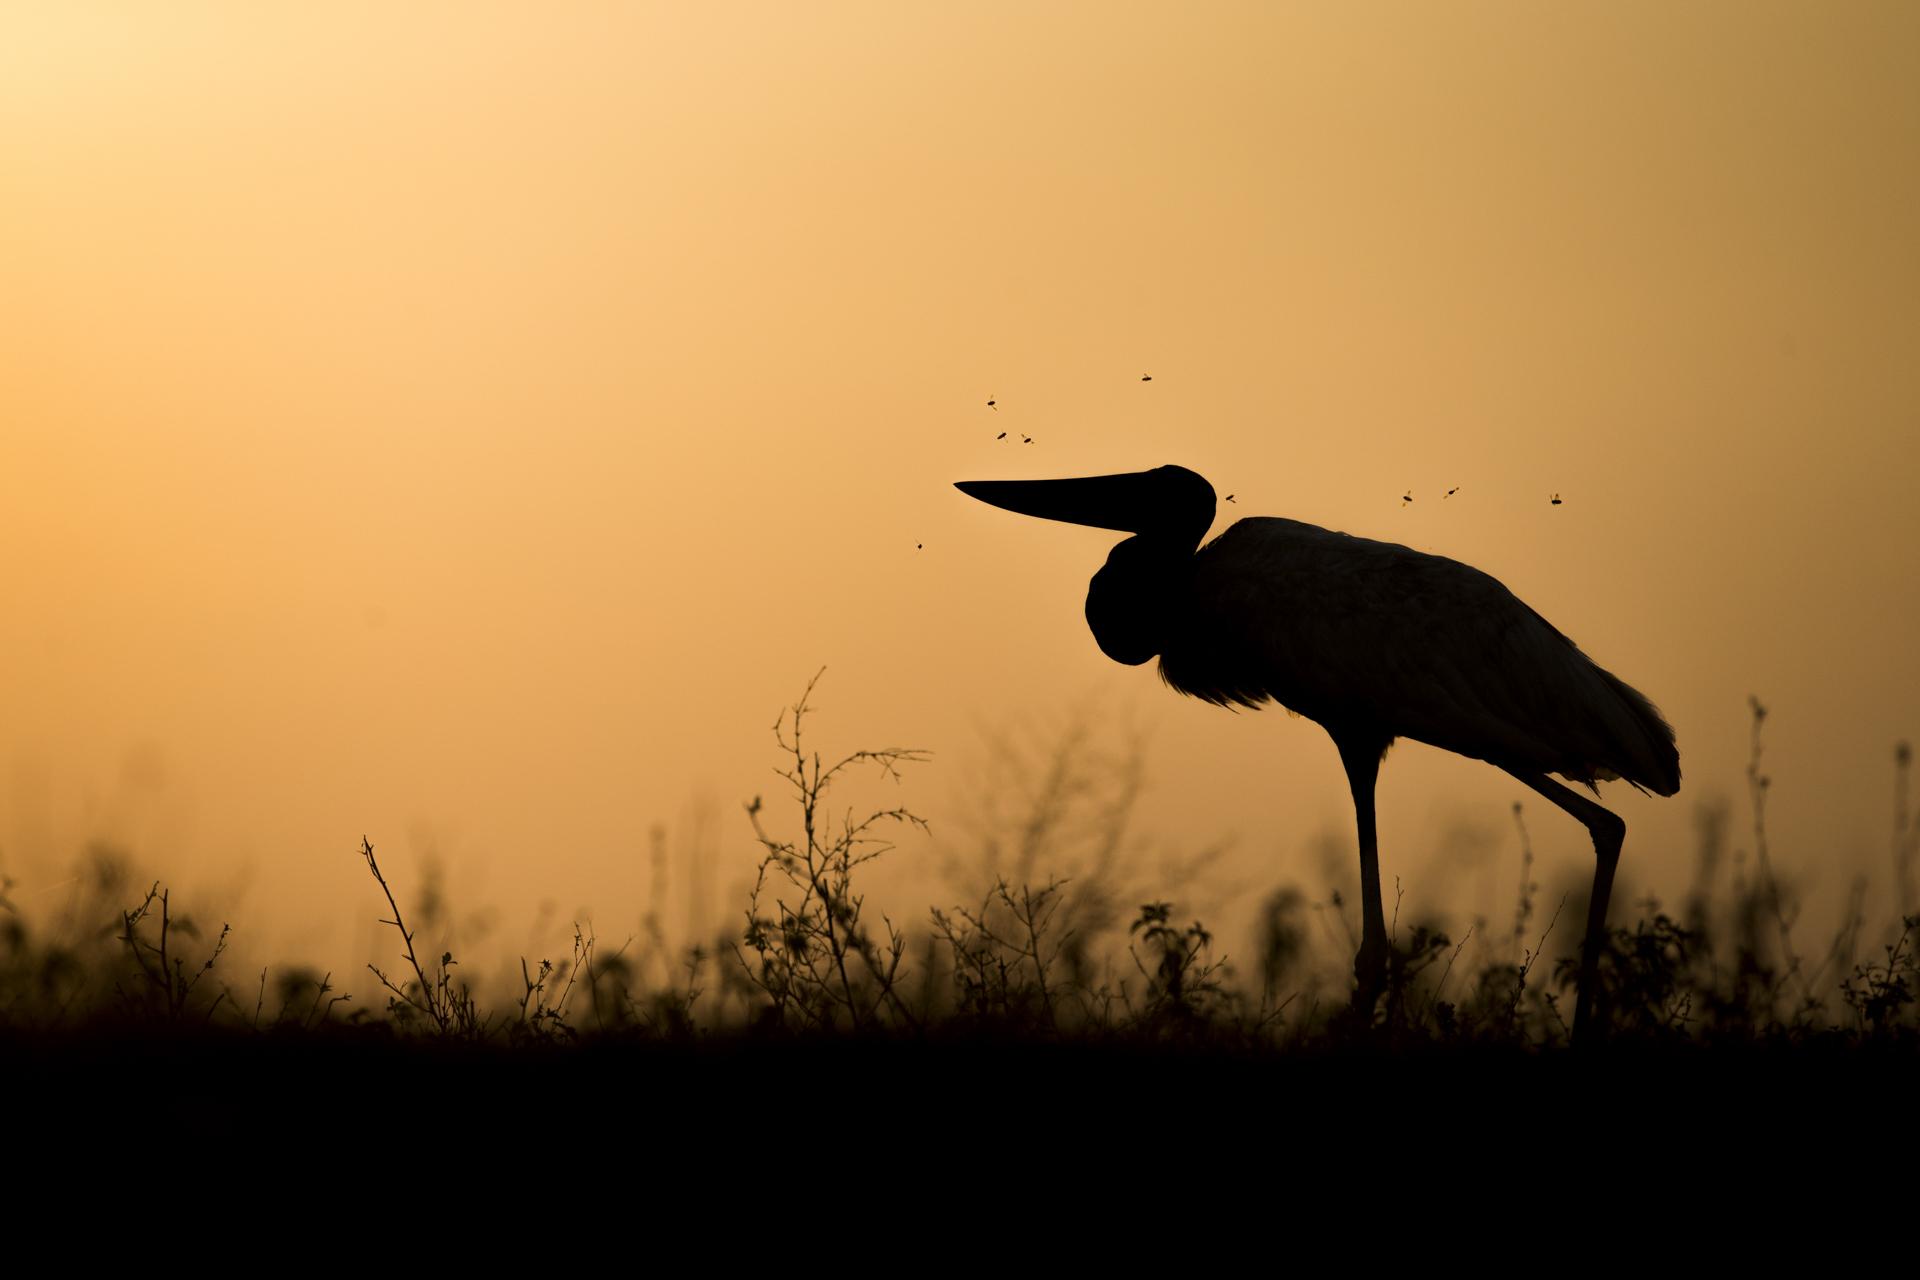 A jabiru stork stalks the riverbank at dusk.